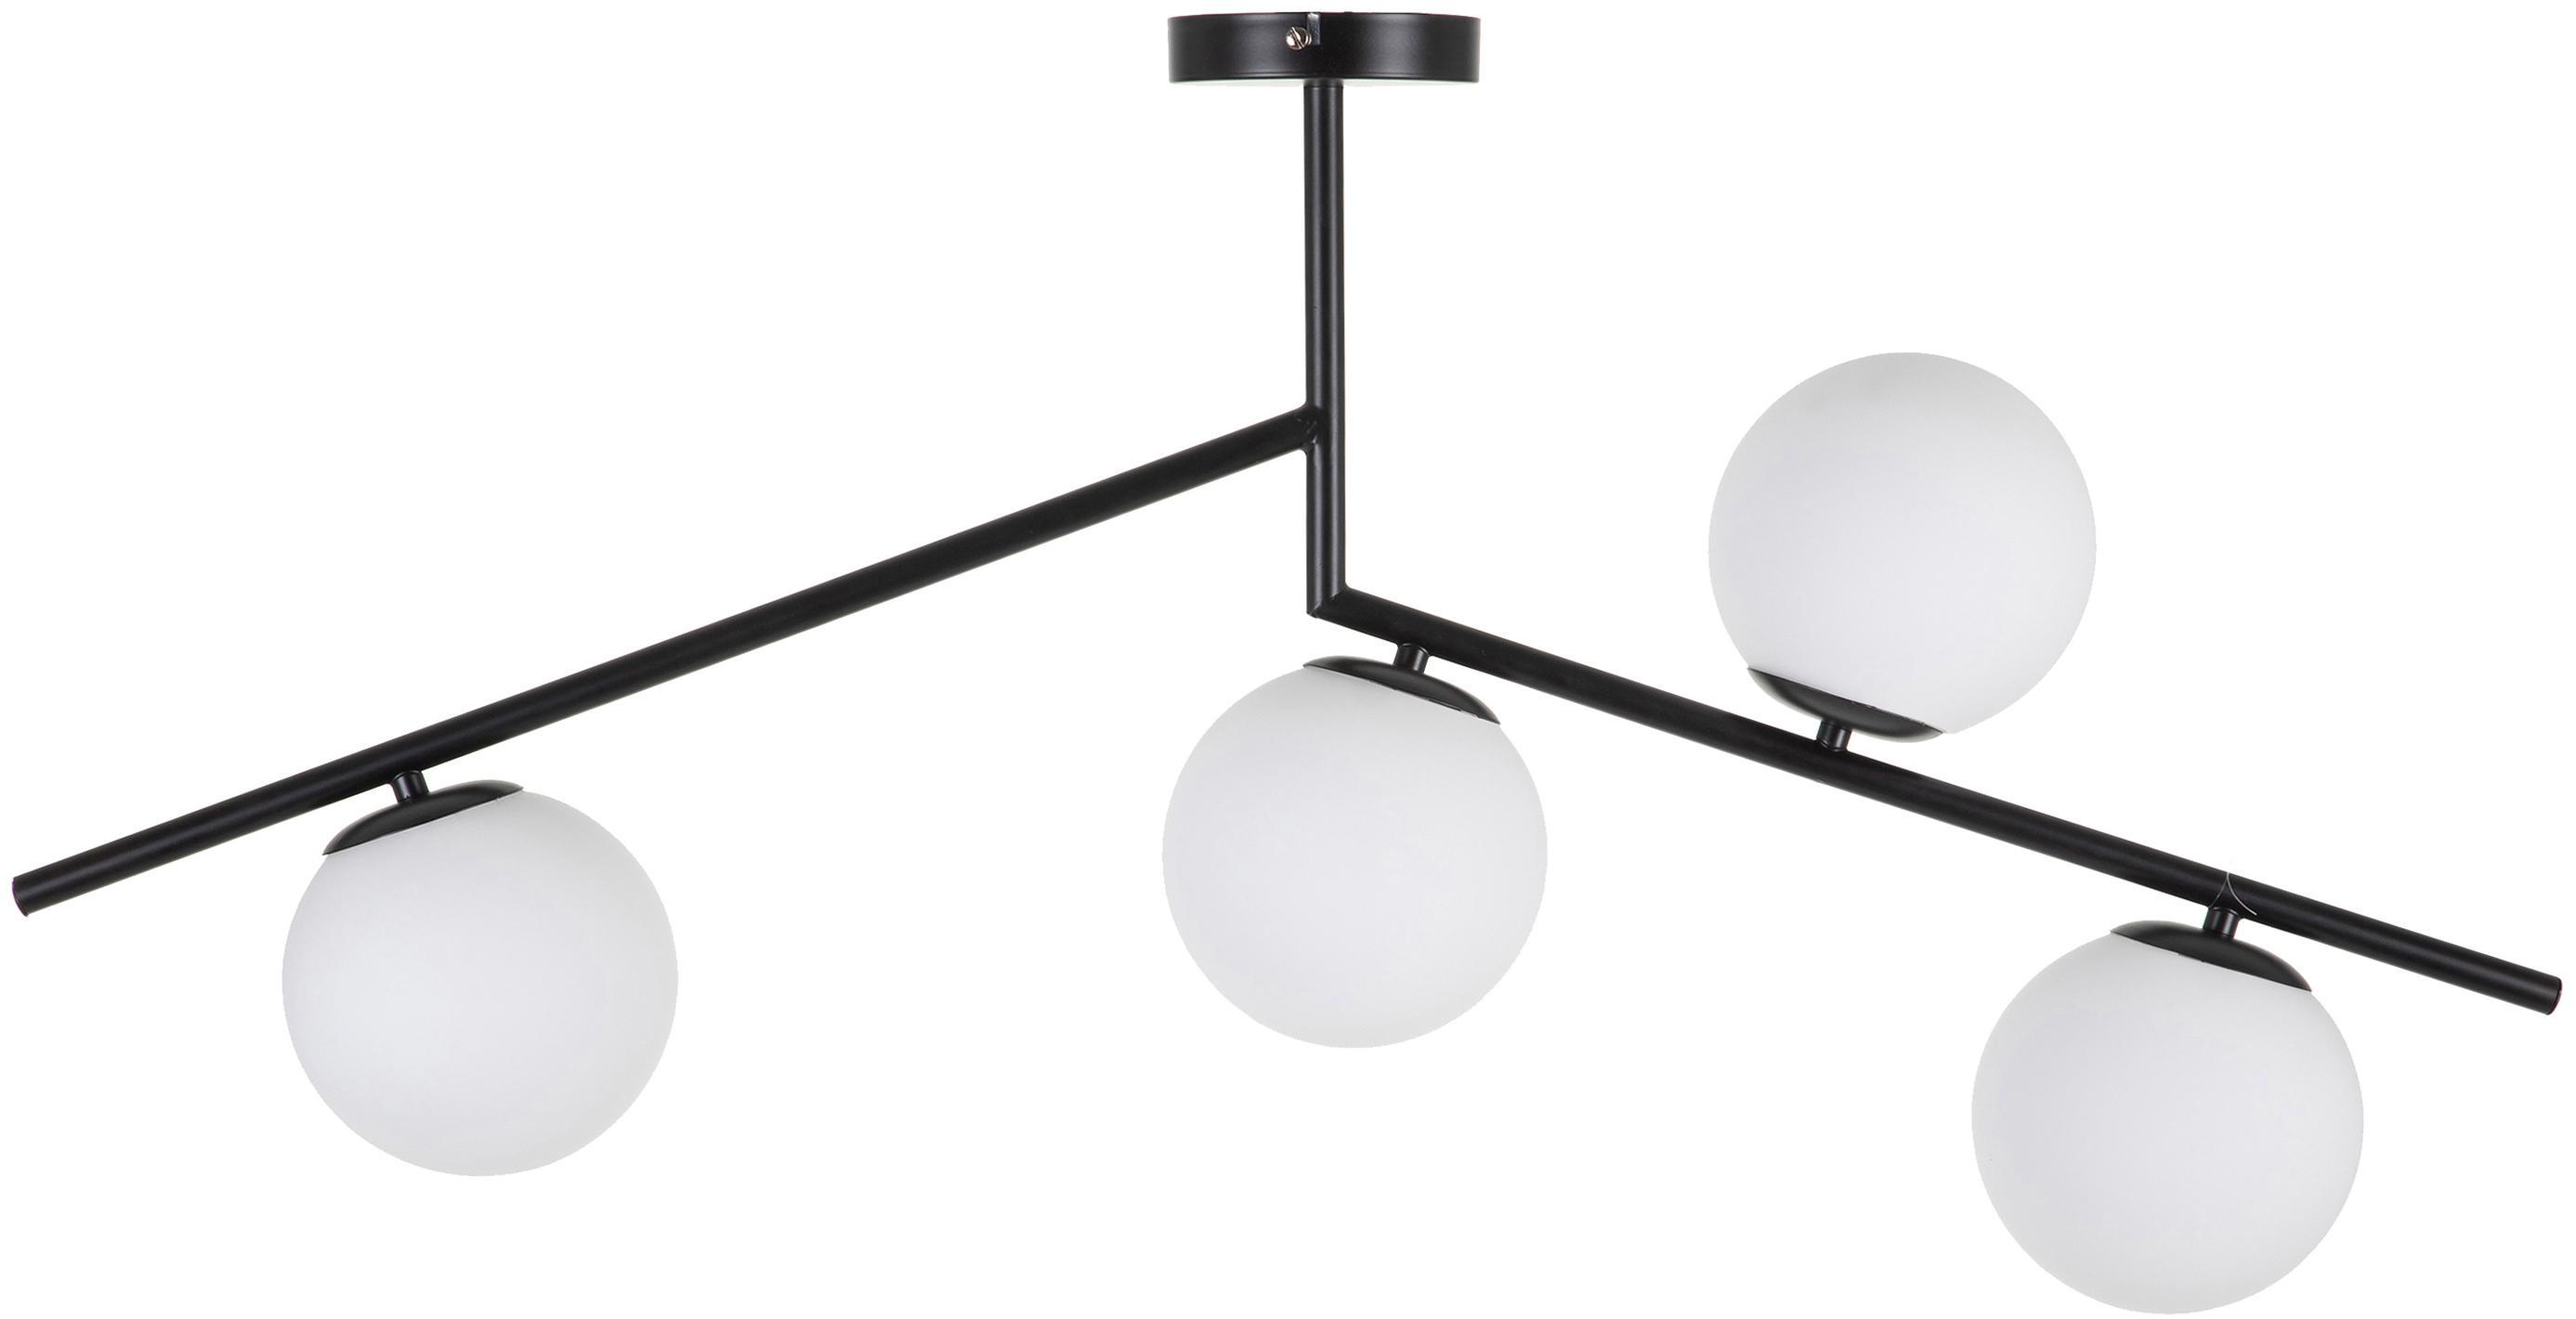 Plafondlamp Spheric, Metaal, glas, Zwart, wit, B 15 x D 98 cm